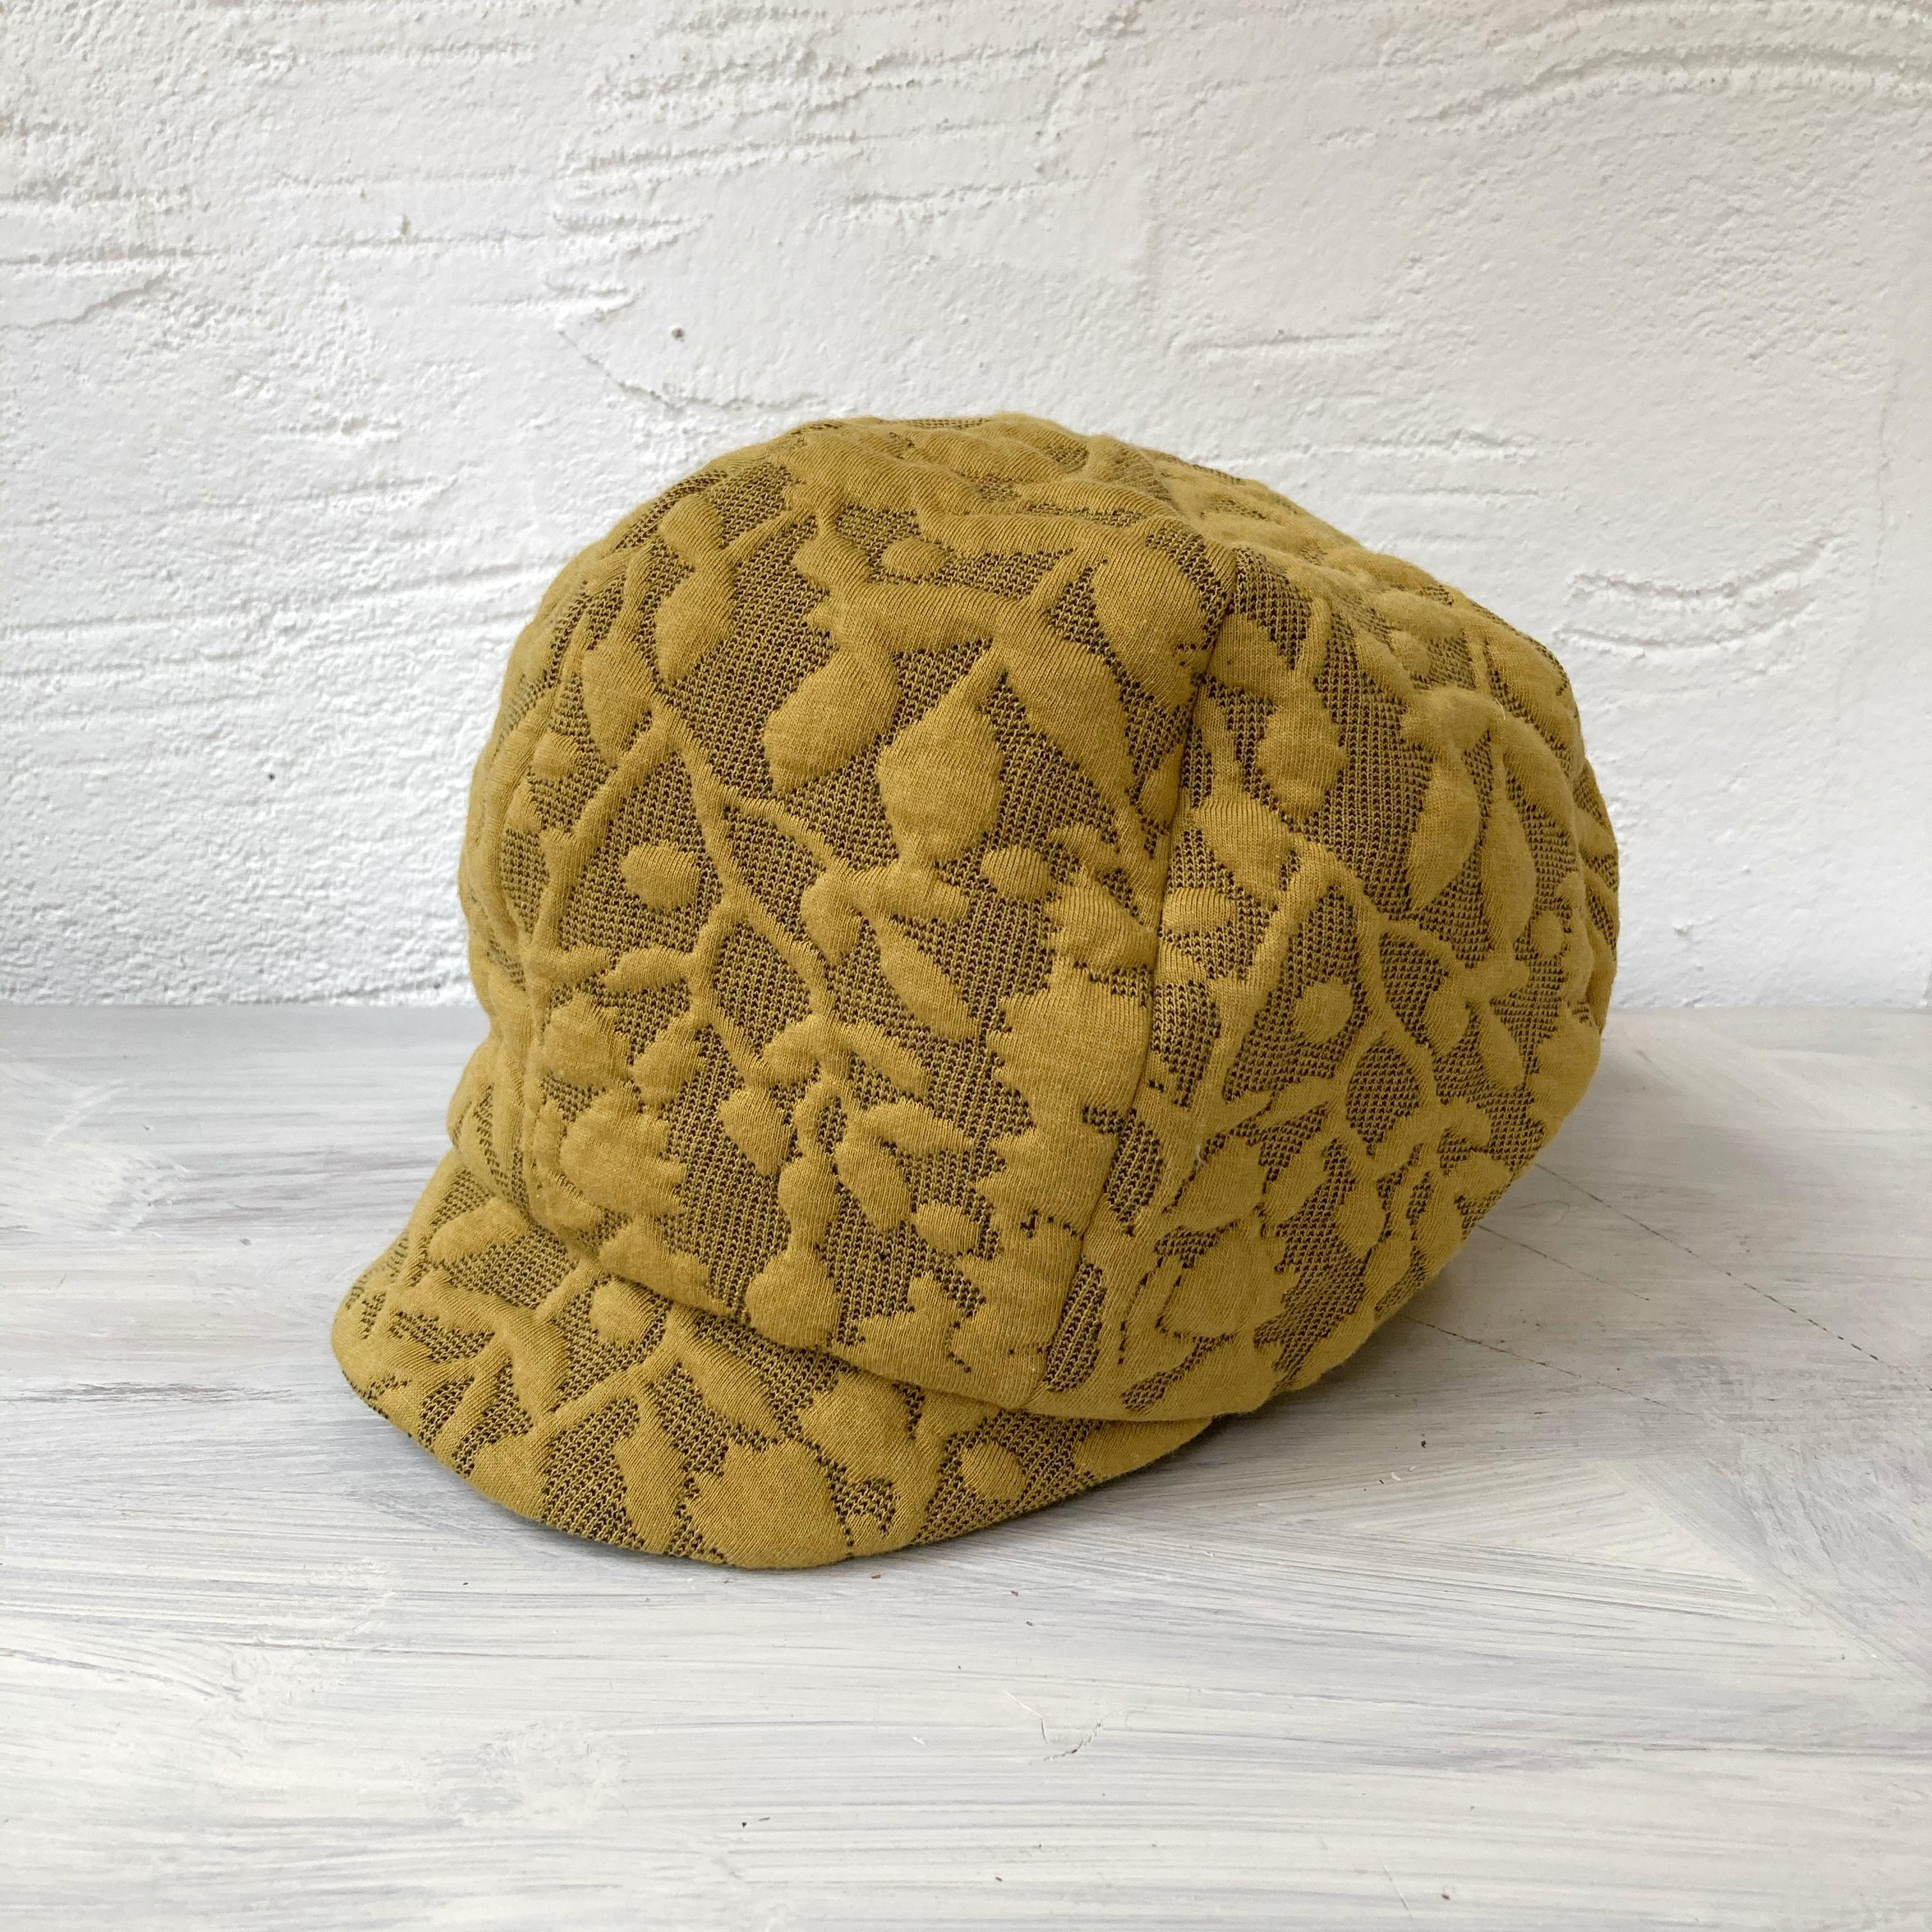 【LuLu de Chapeau】凹凸ニットJQキャスケット帽(イエロー)